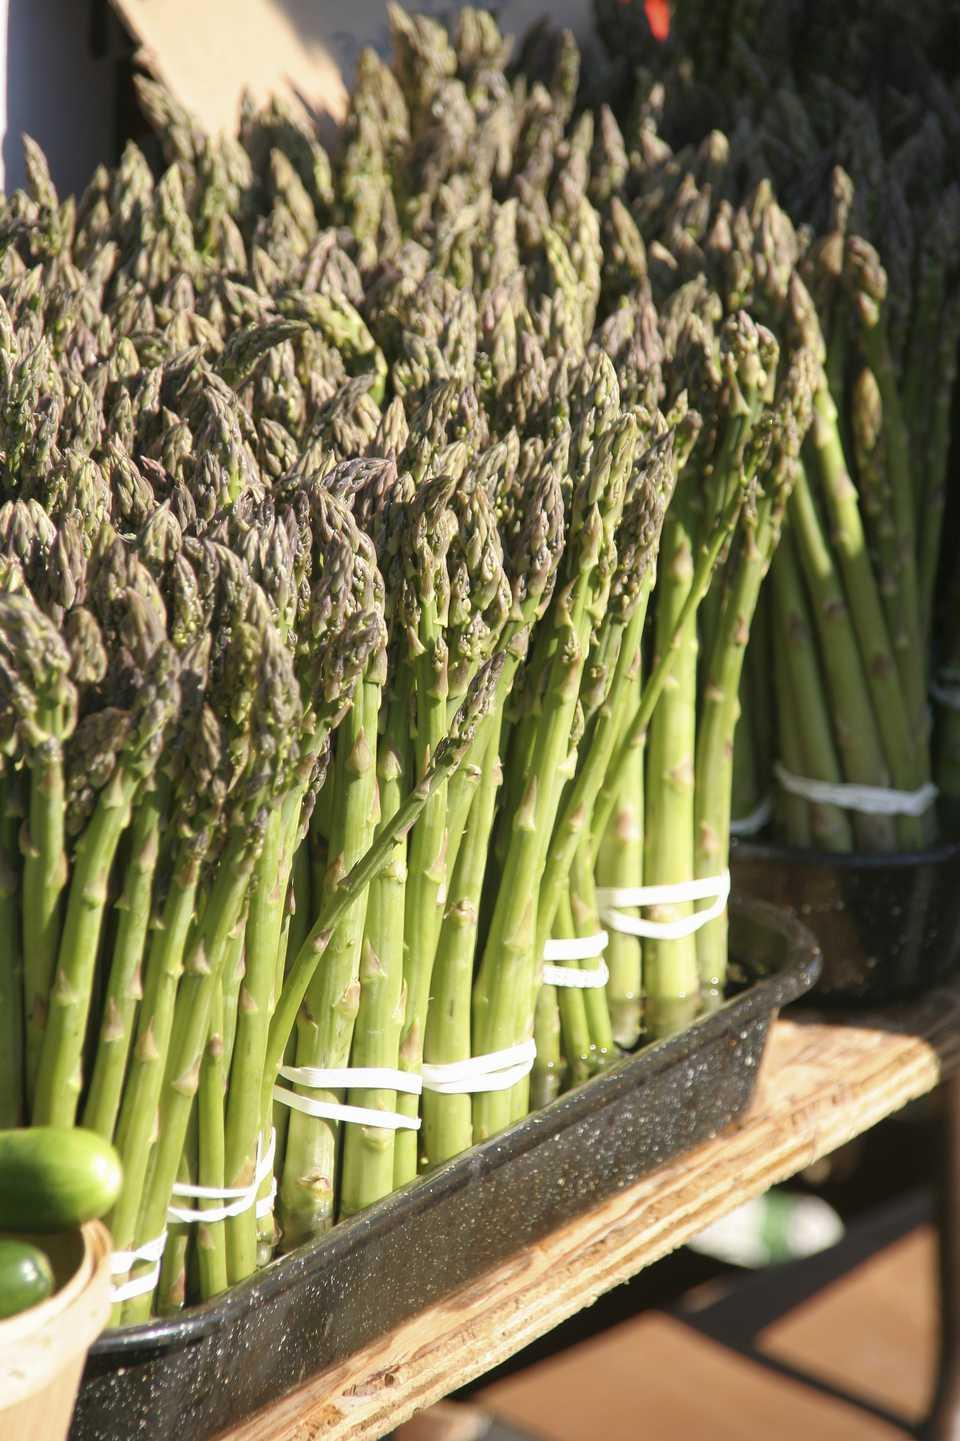 Asparagus at a farmers market, Kitchener, Ontario